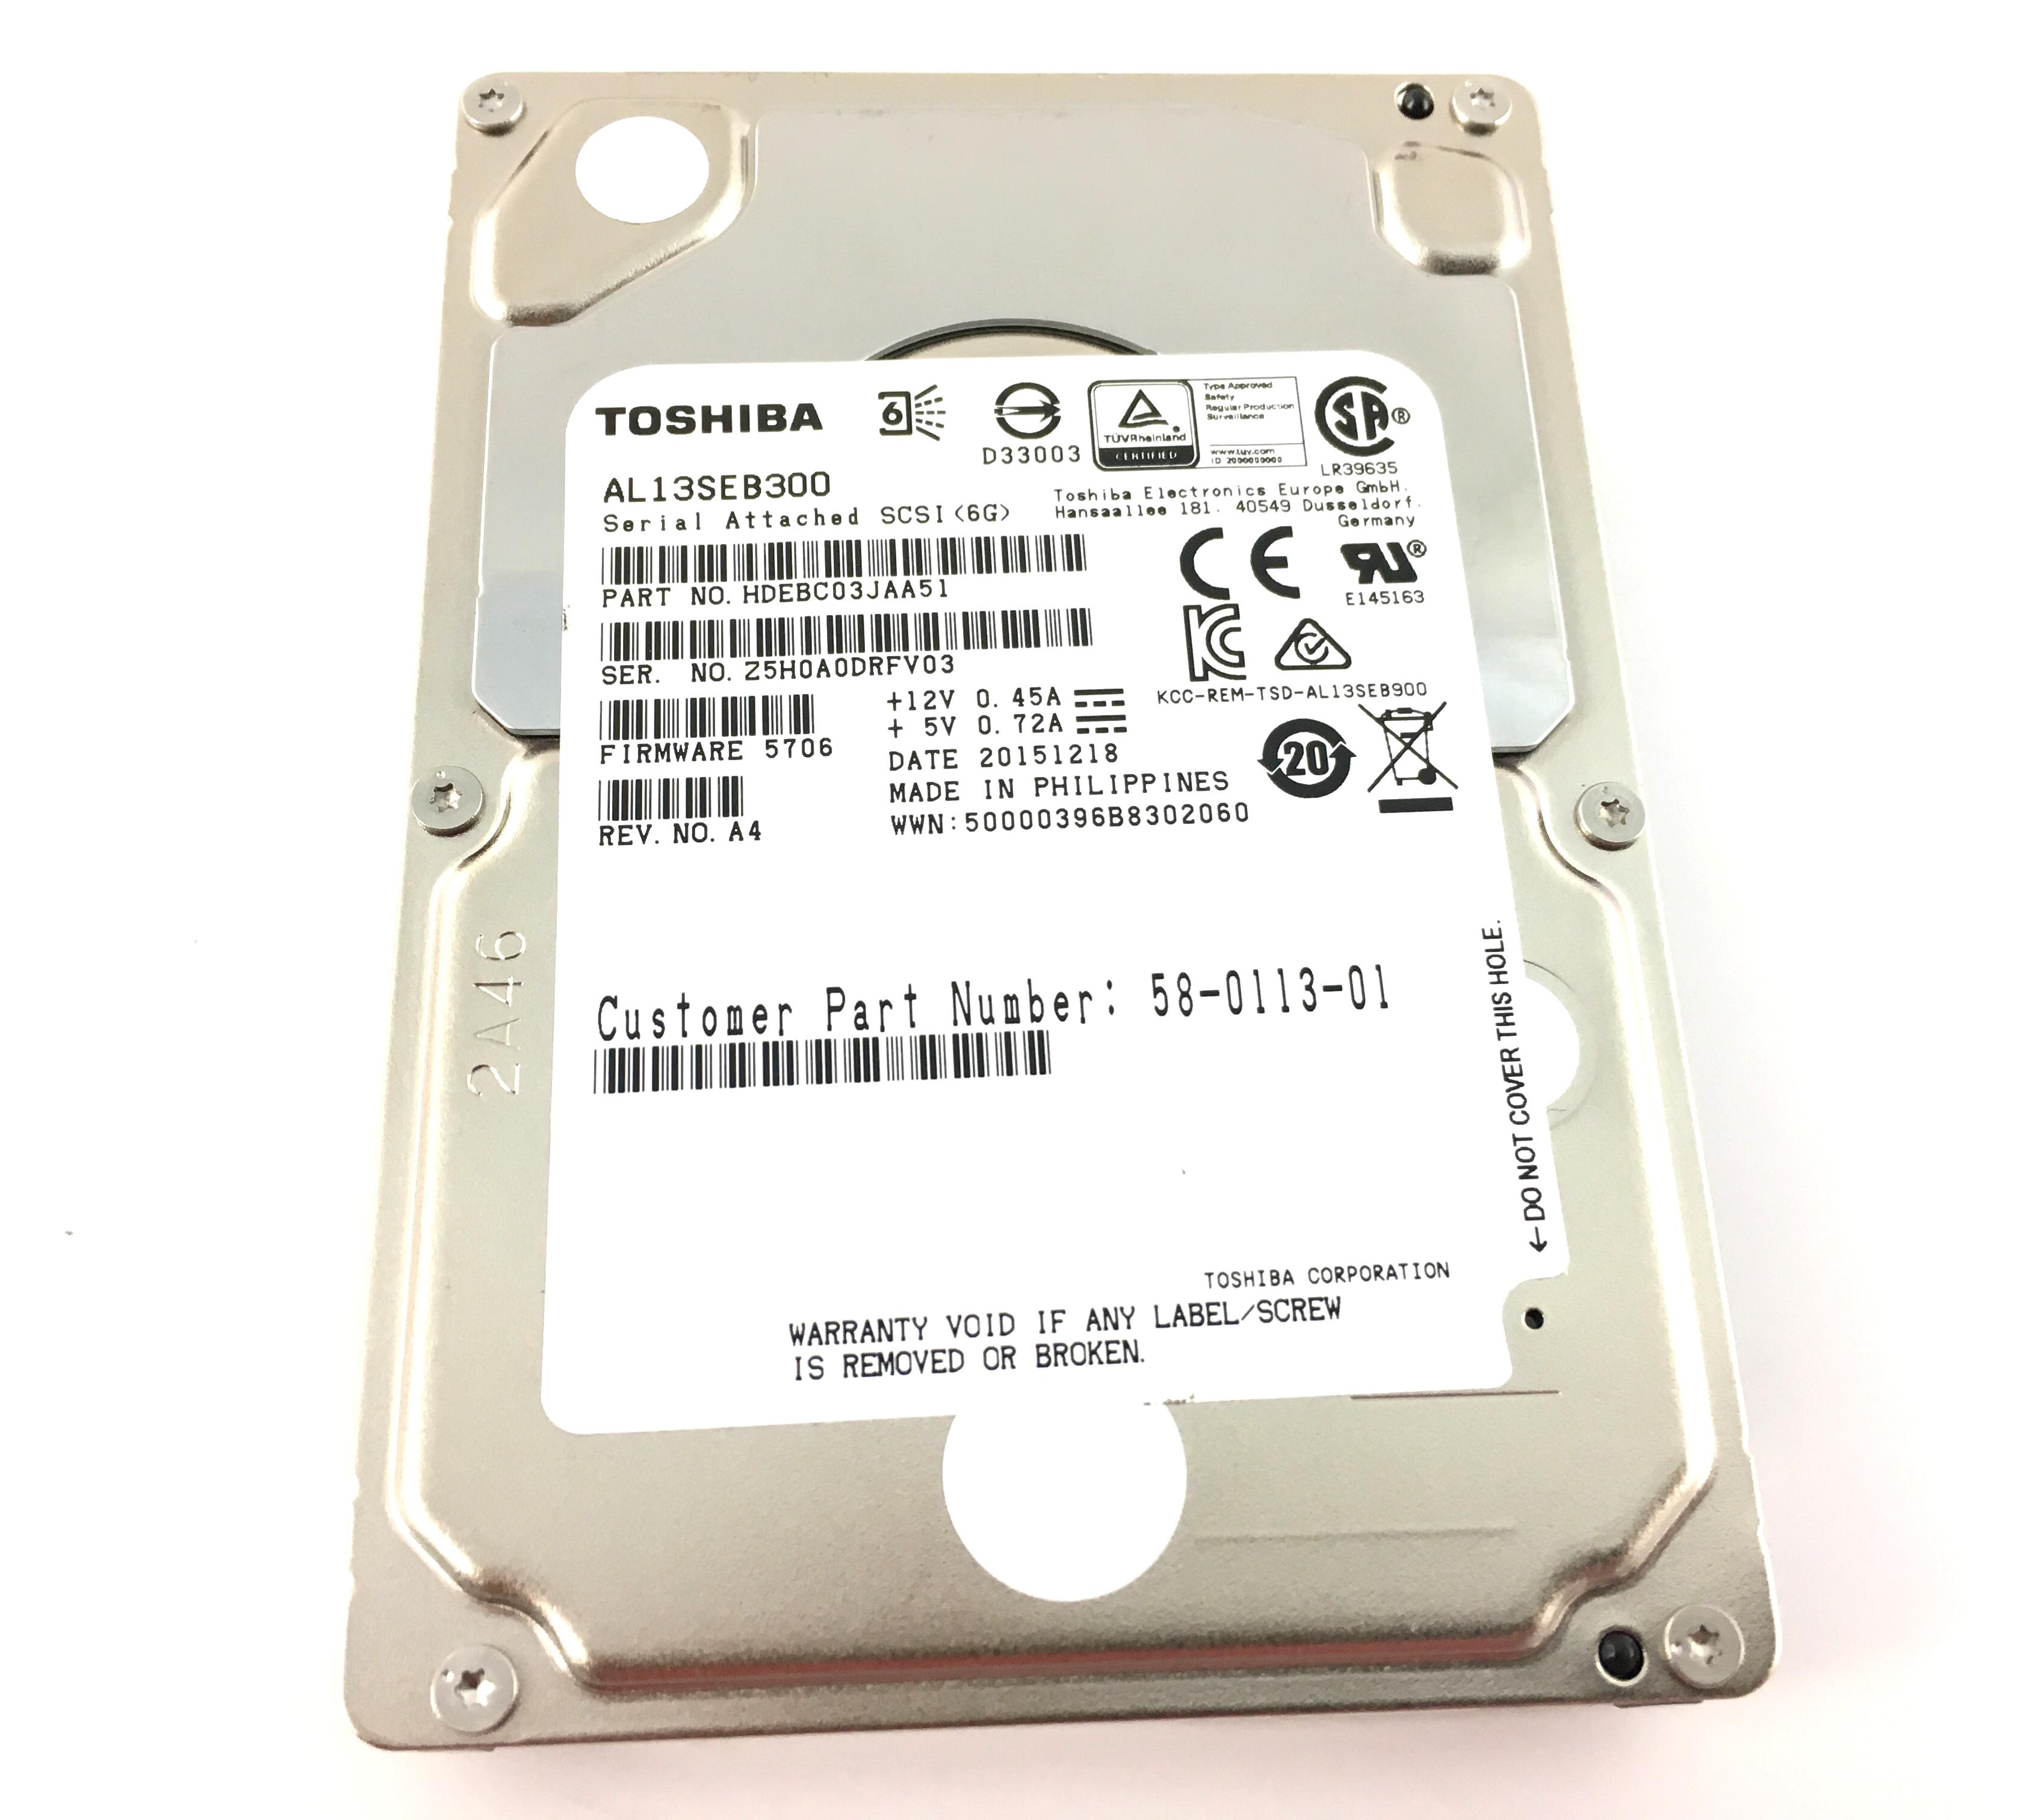 Toshiba 300GB 10K 6Gbps SAS 2.5'' Hard Drive (AL13SEB300)